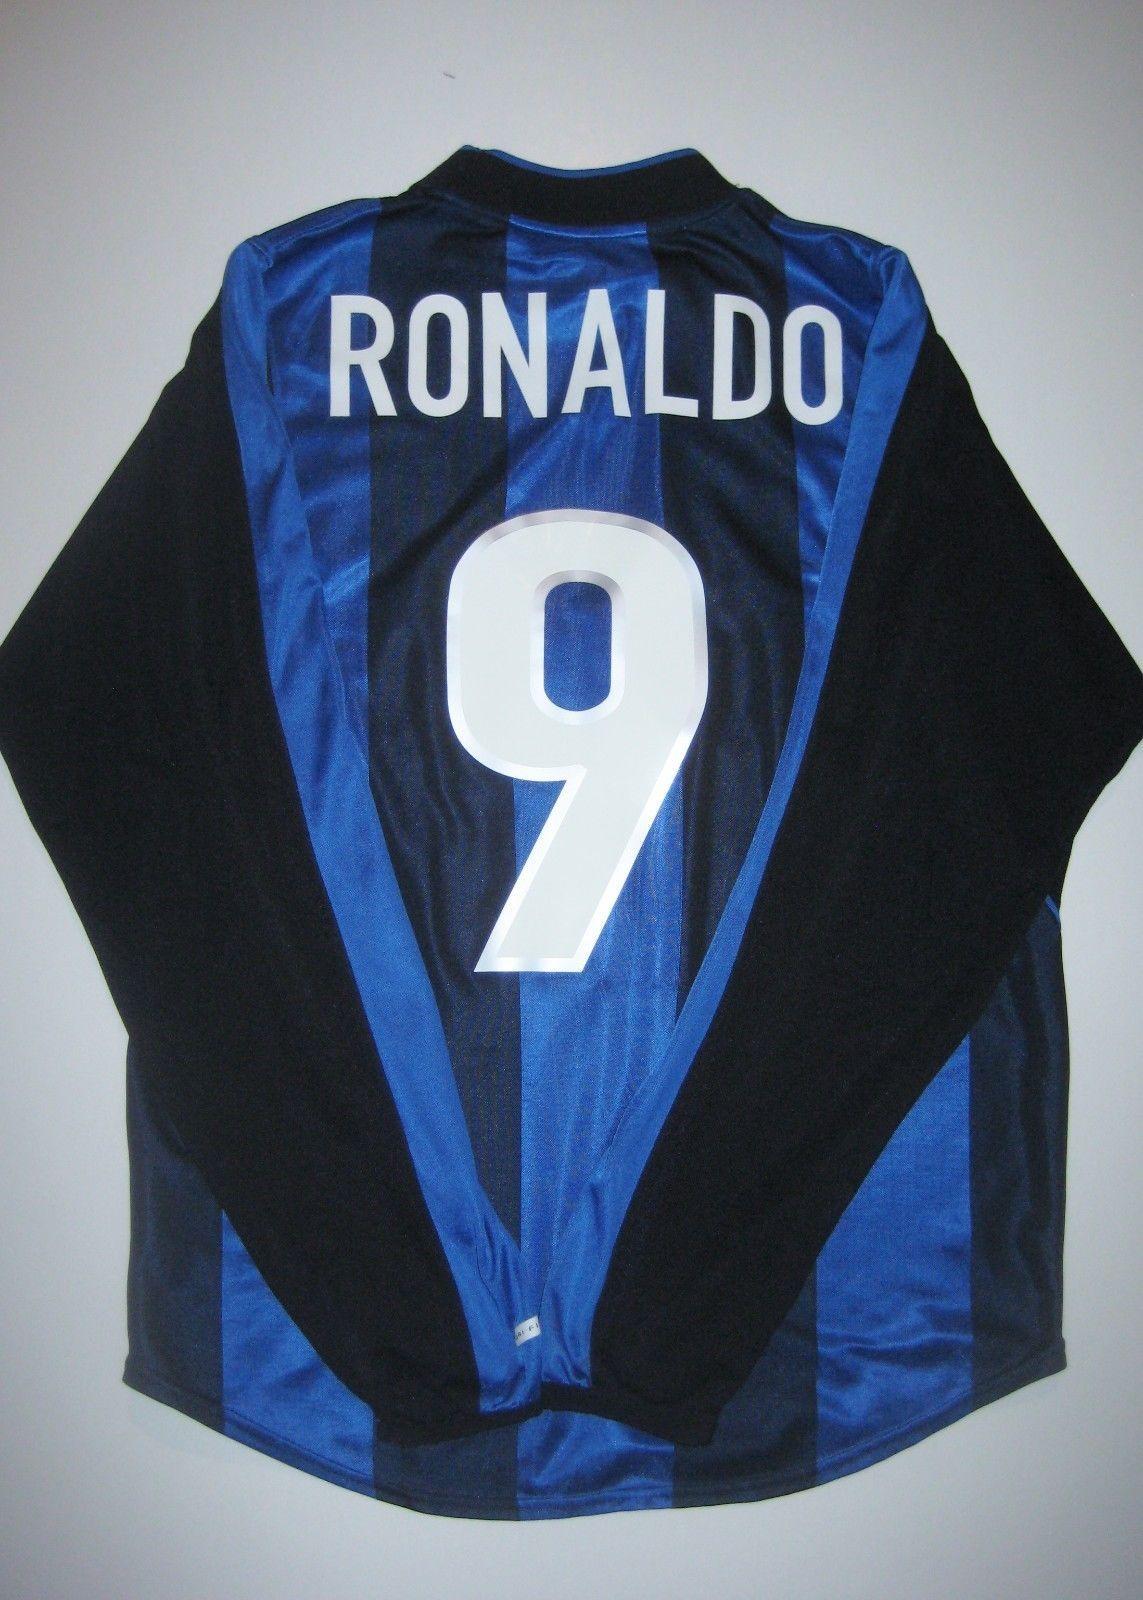 bb3e67ca0 Nike Inter Milan Ronaldo  9 Jersey Kit Shirt Brazil 2000-2001 Long Sleeve  L S (eBay Link)